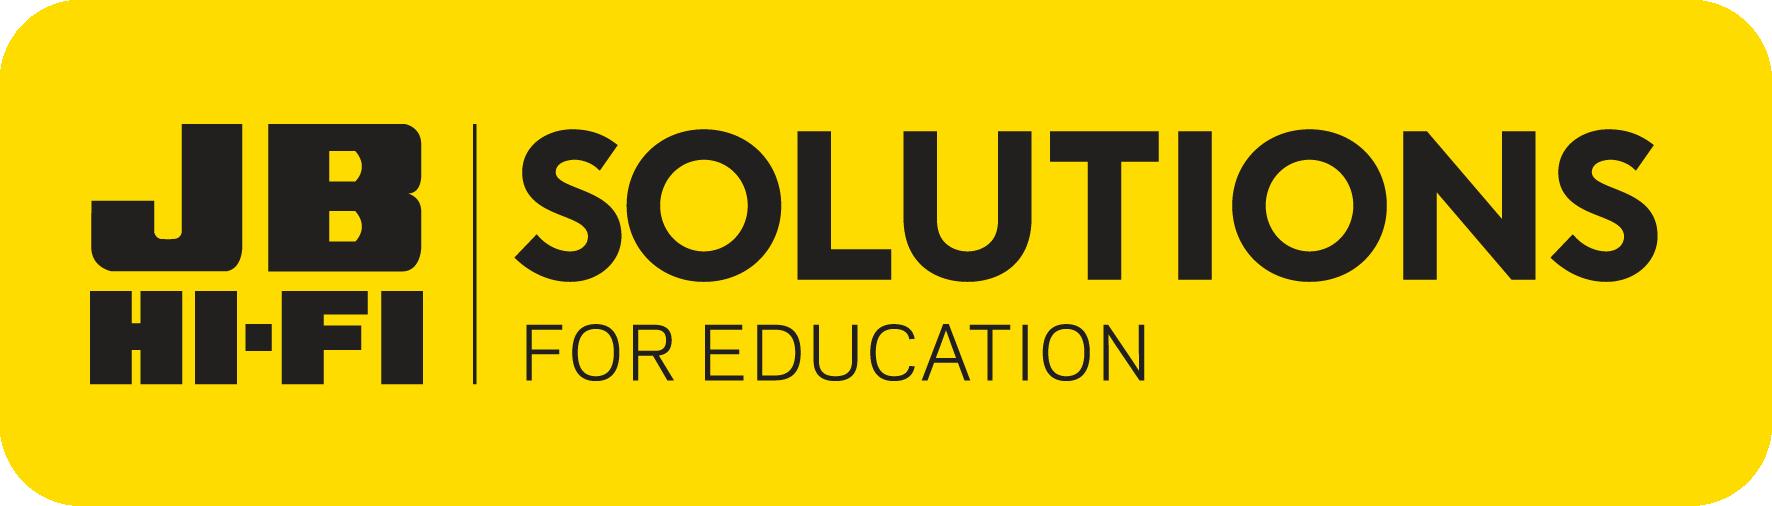 JB Hi-Fi Education BYOD